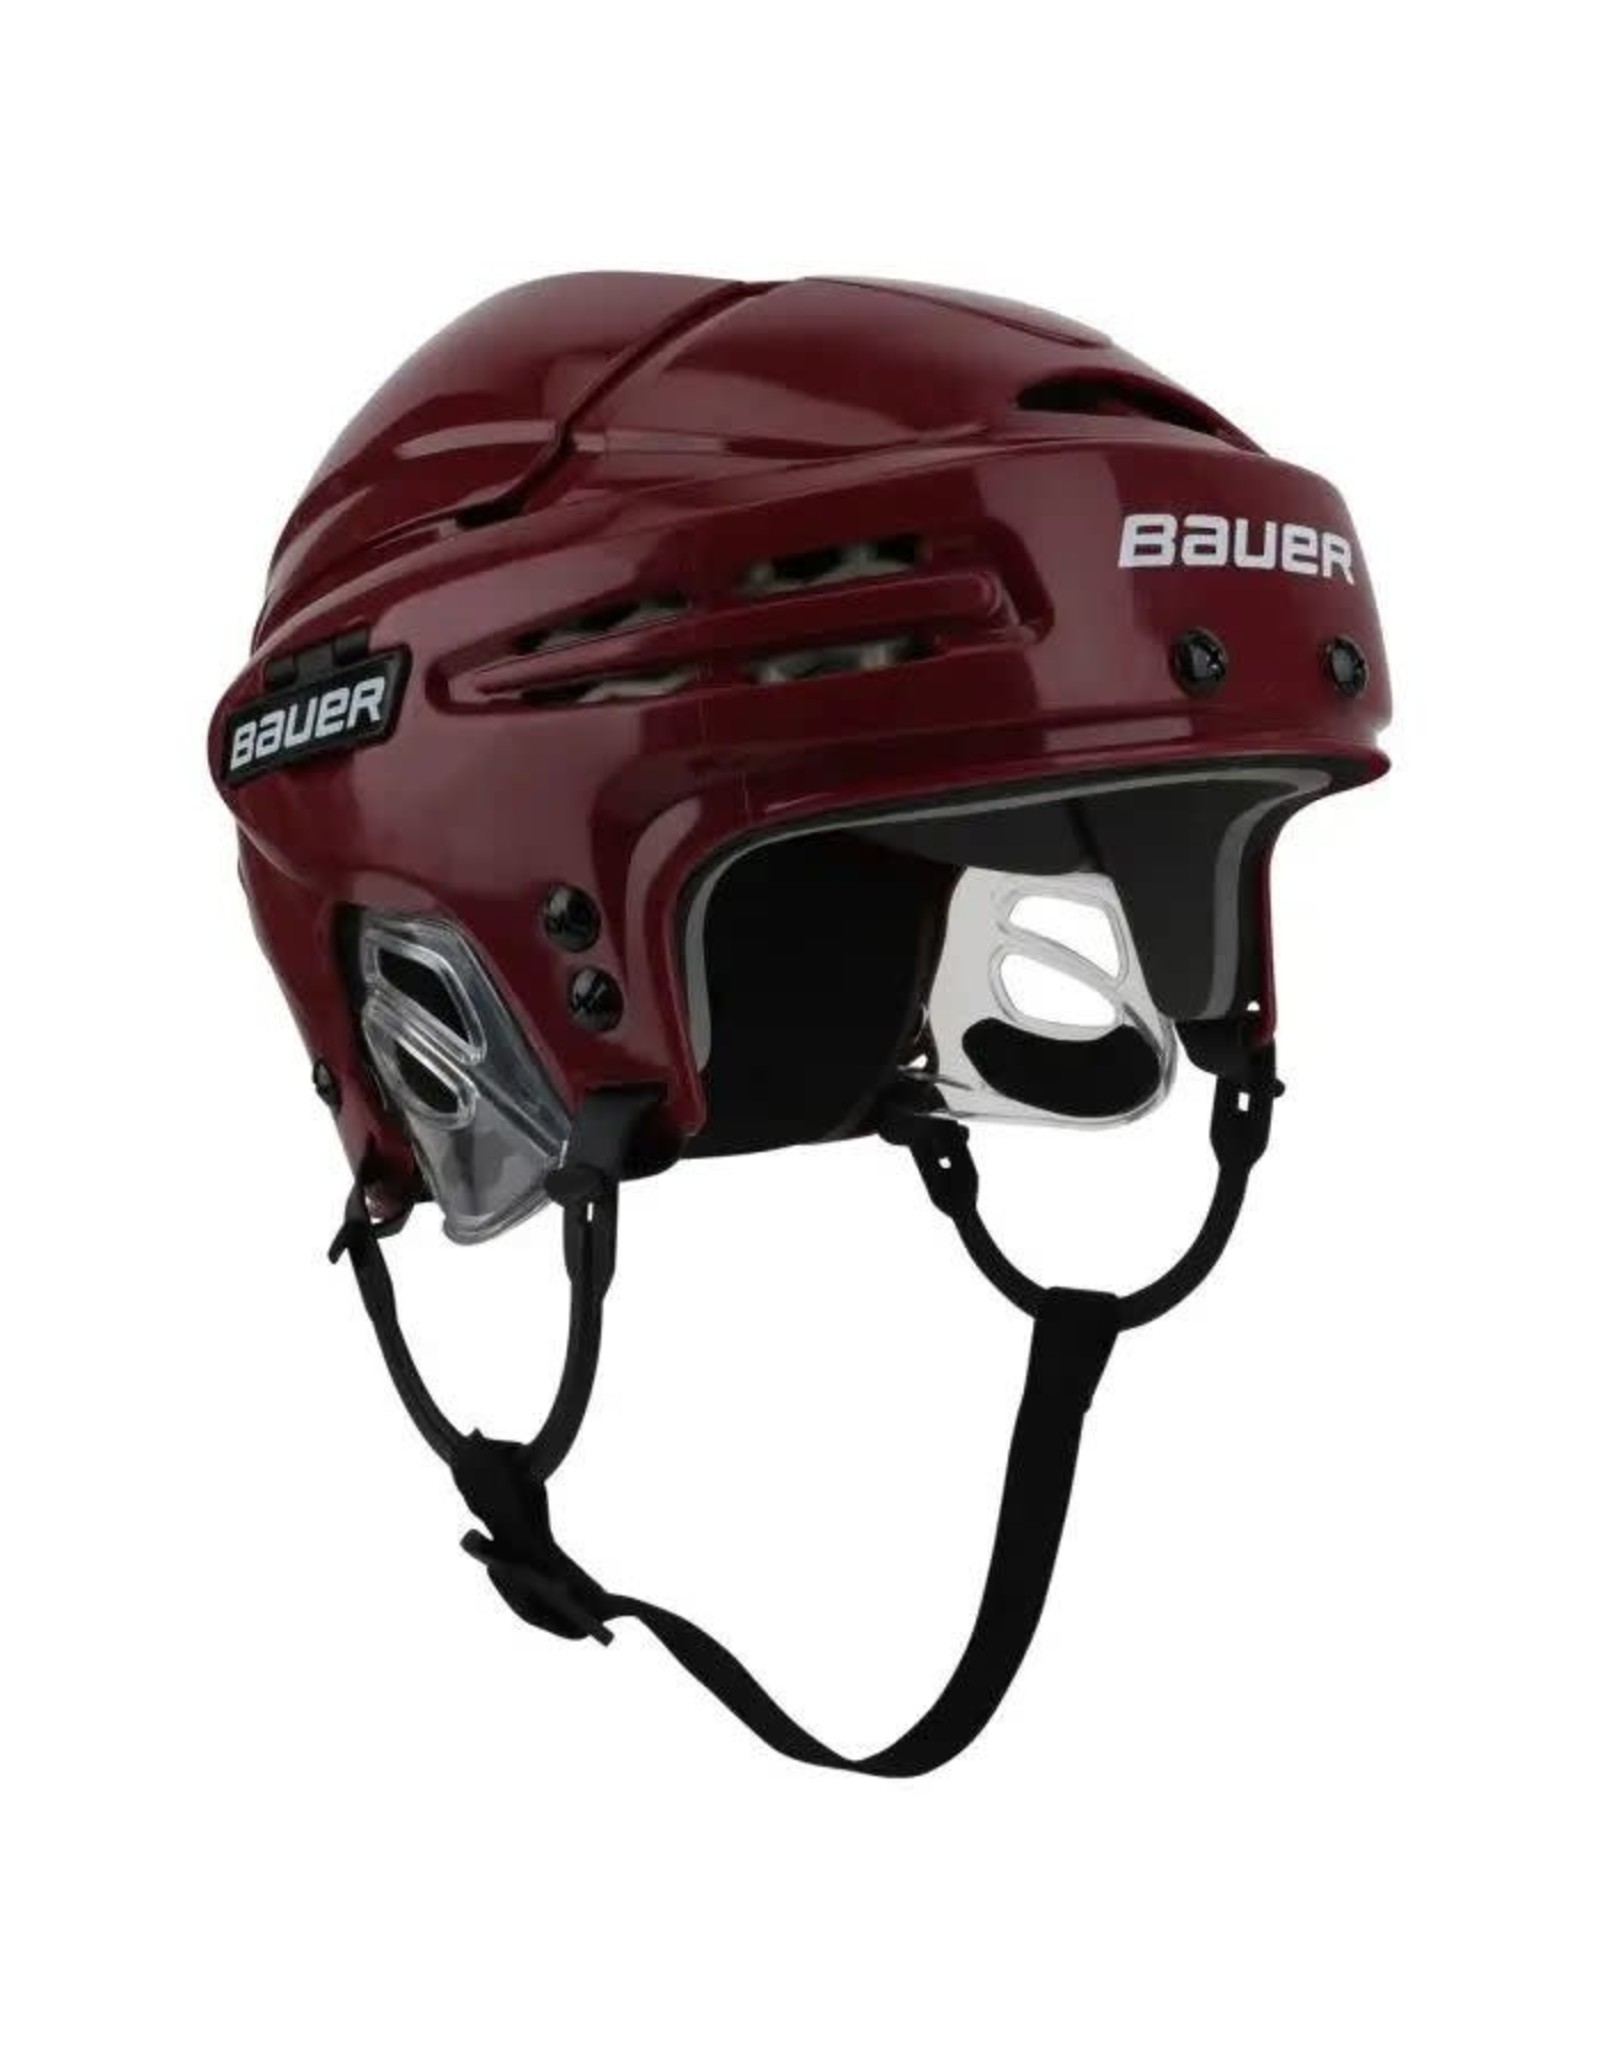 BAUER 5100, Hockey Helmet